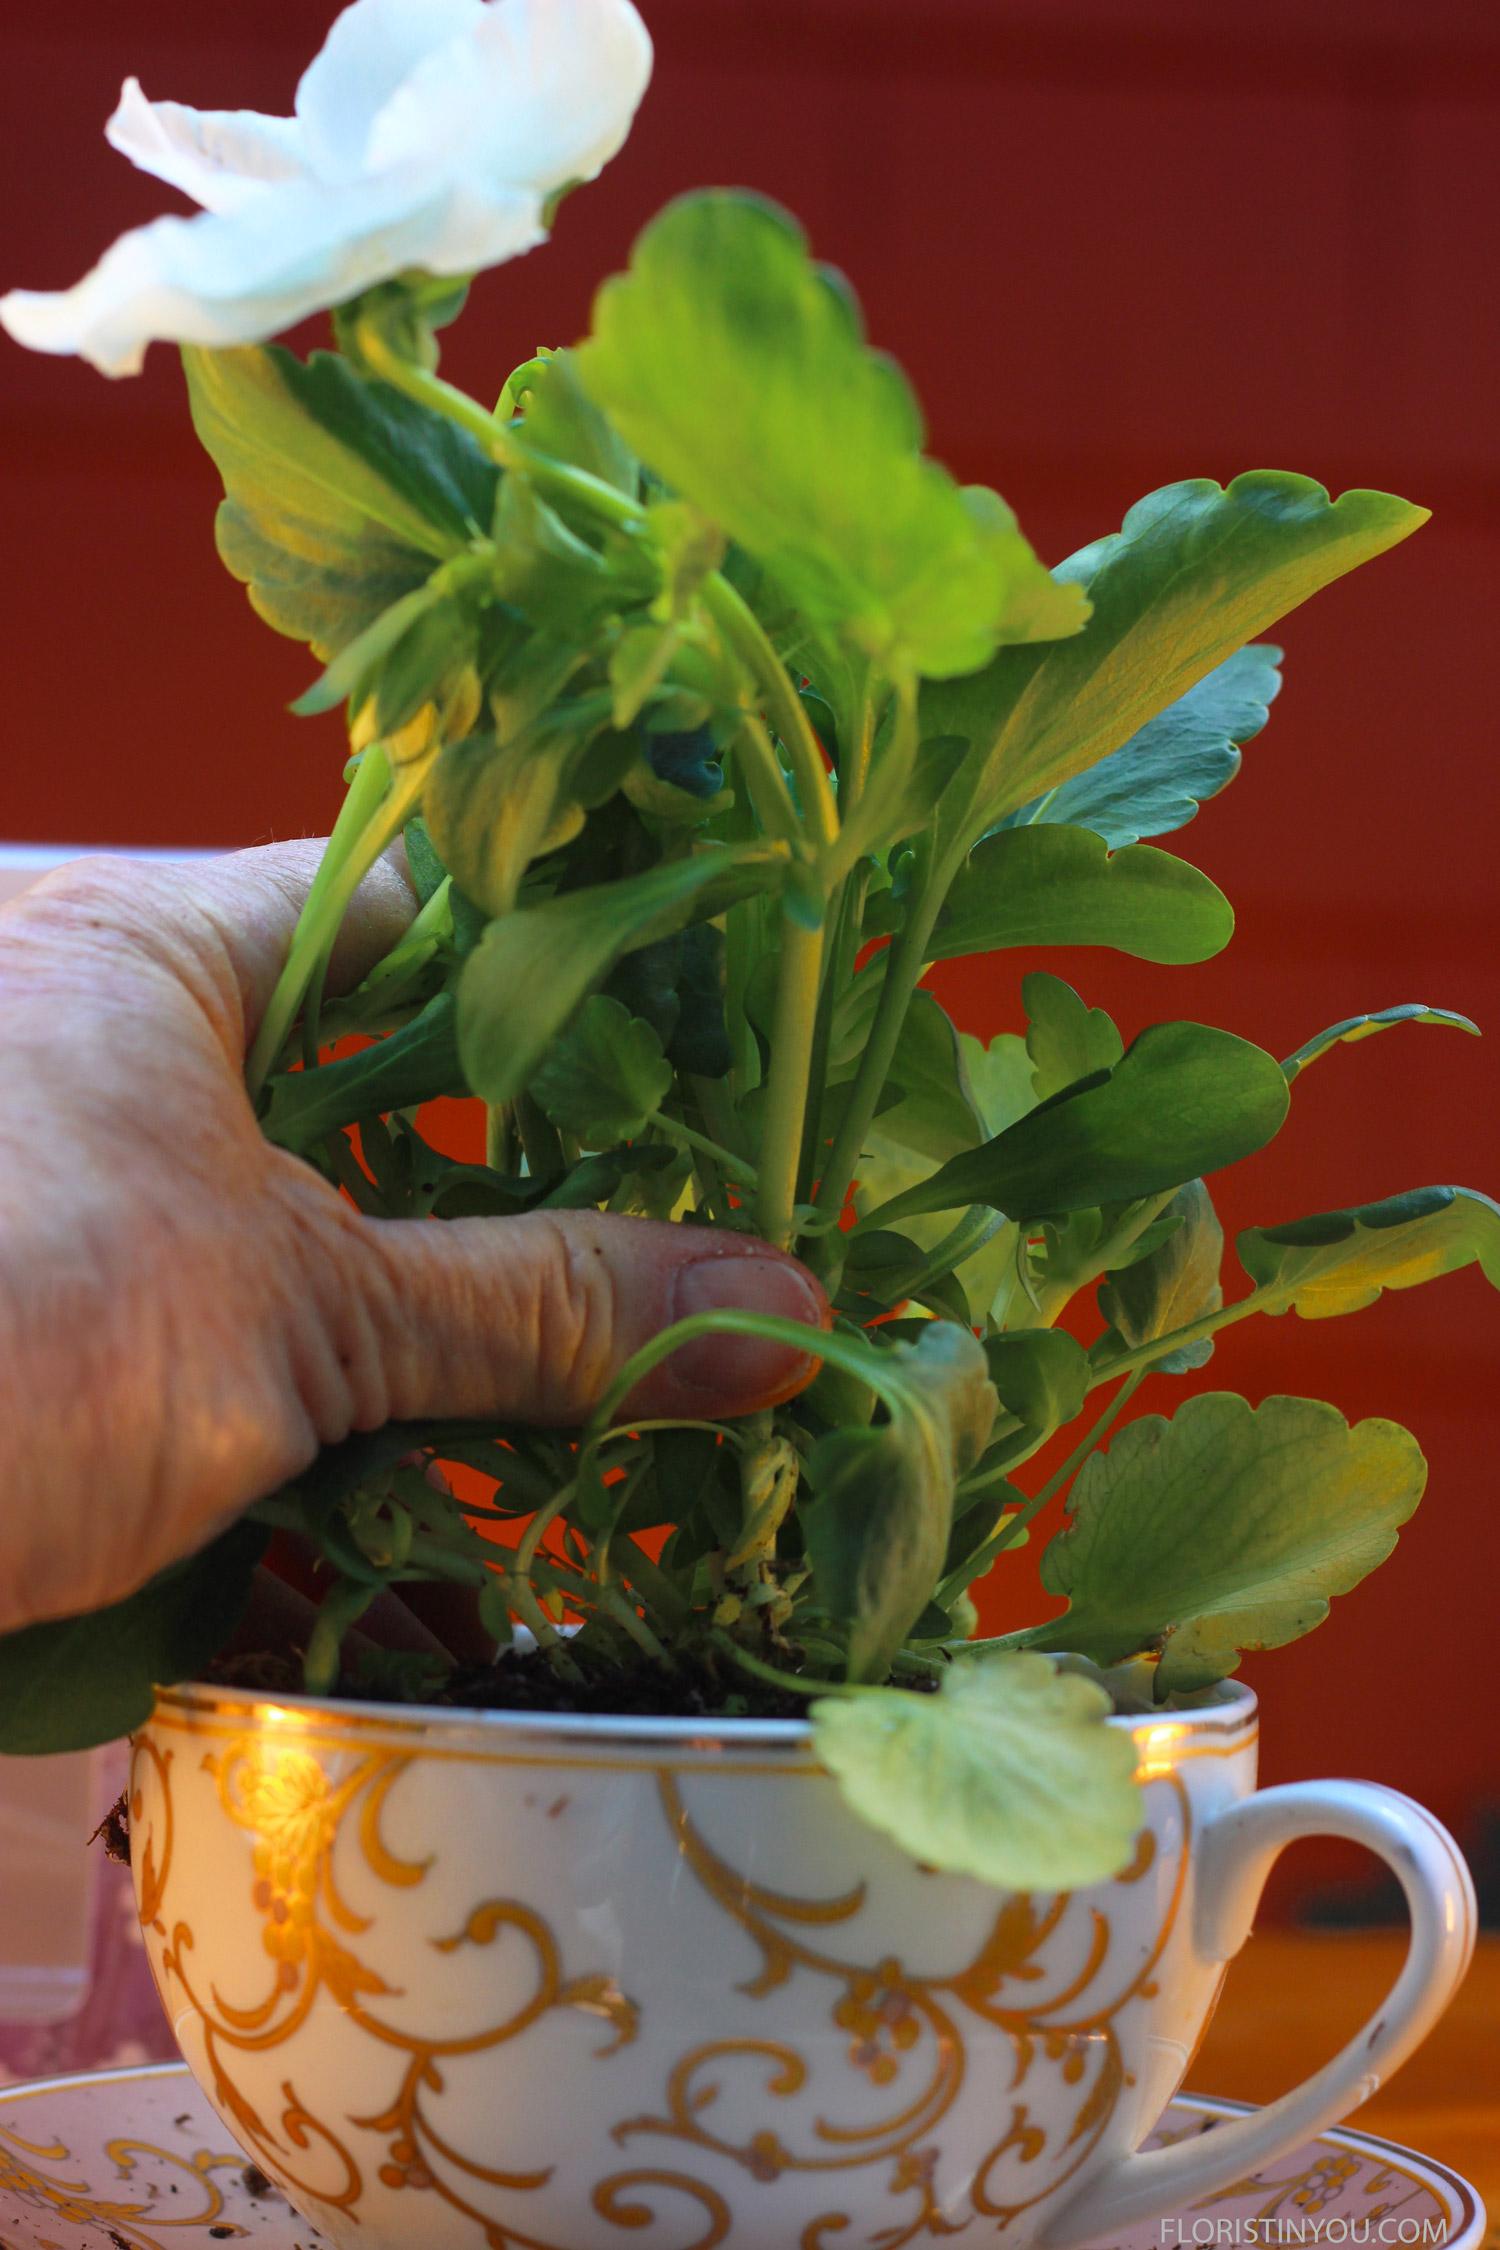 Plant pansy.